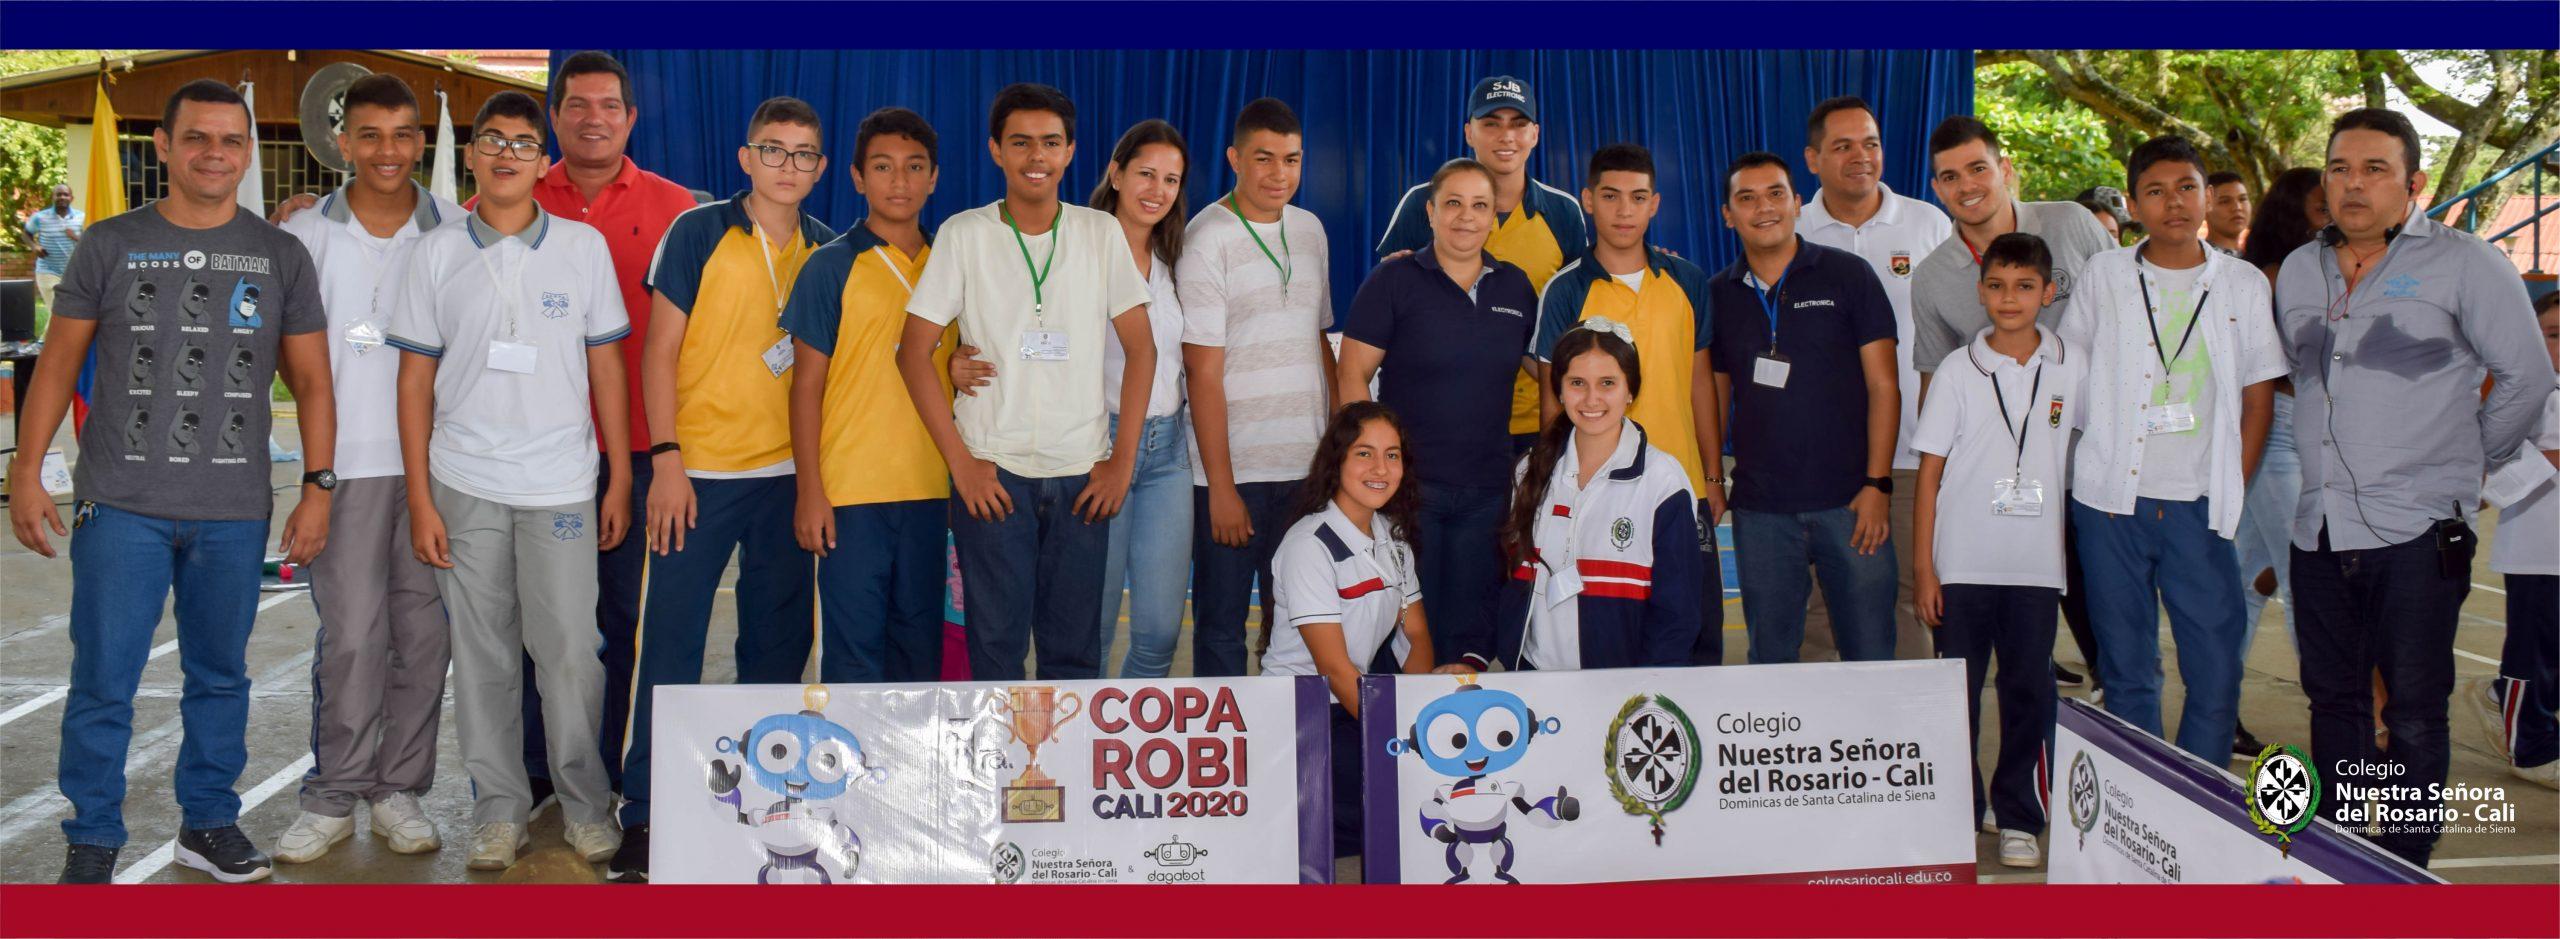 Banner Col Rosario 2012